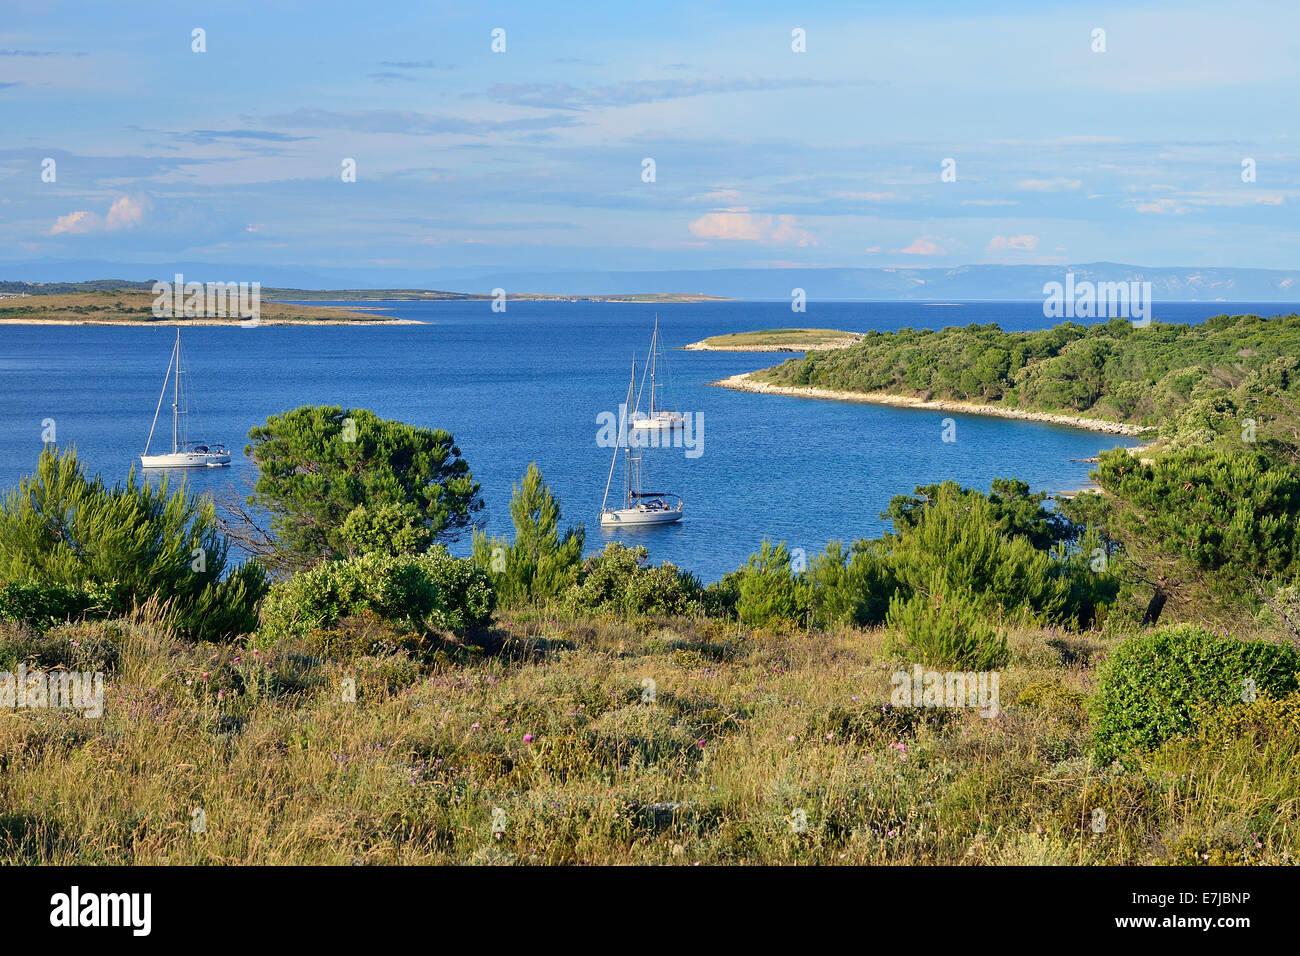 Yachts anchored in a bay, Cape Kamenjak, Premantura, Istria, Croatia - Stock Image